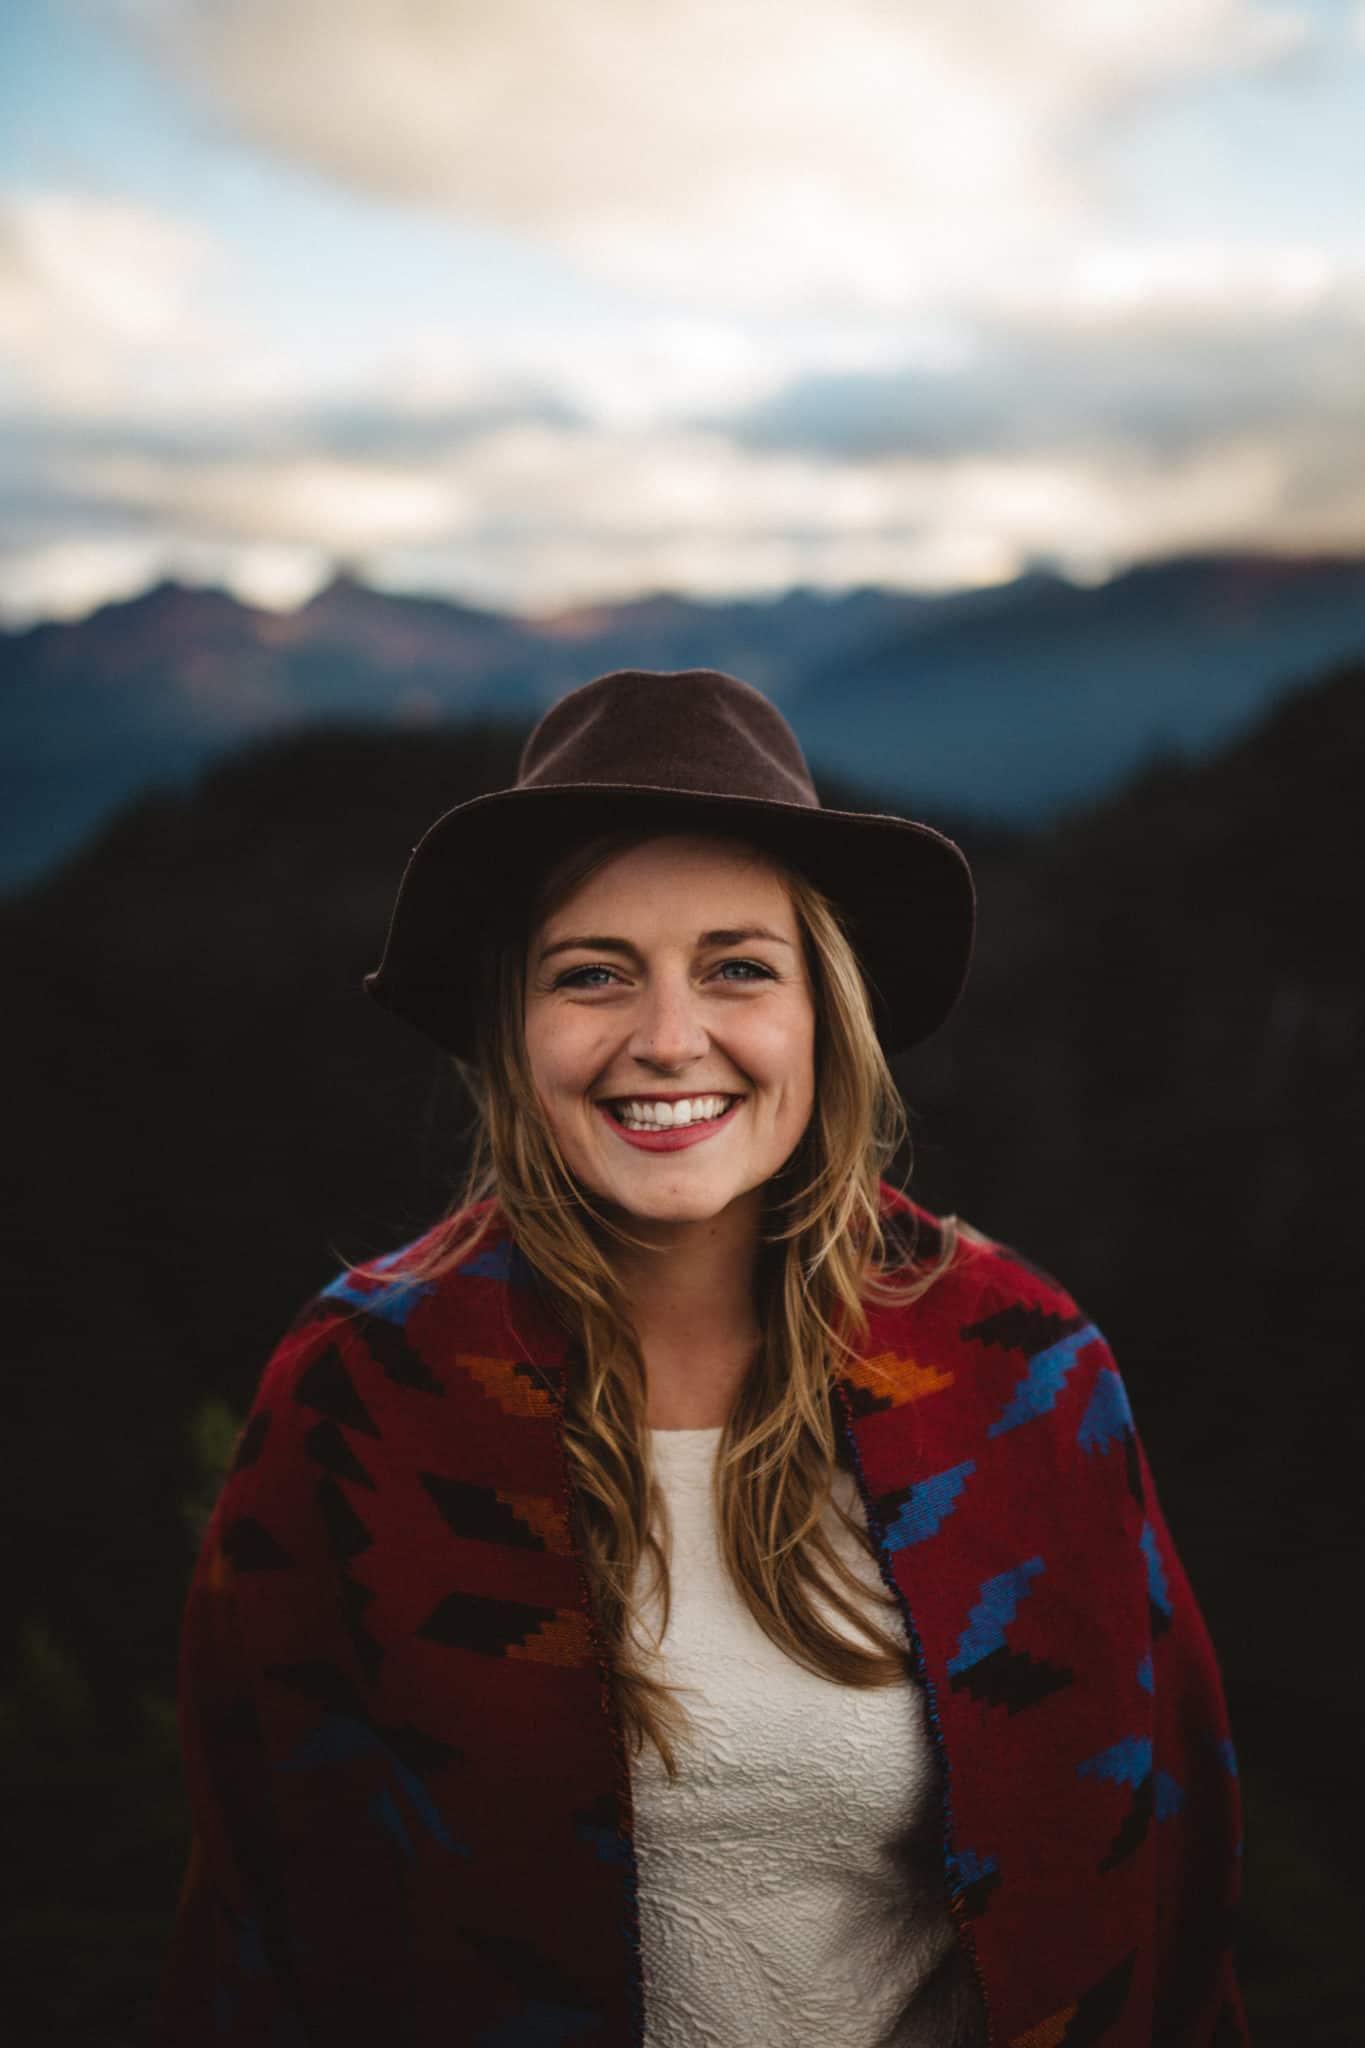 Artist Point, Mt Baker - PNW Engagement shoot locations - TheMandagies.com